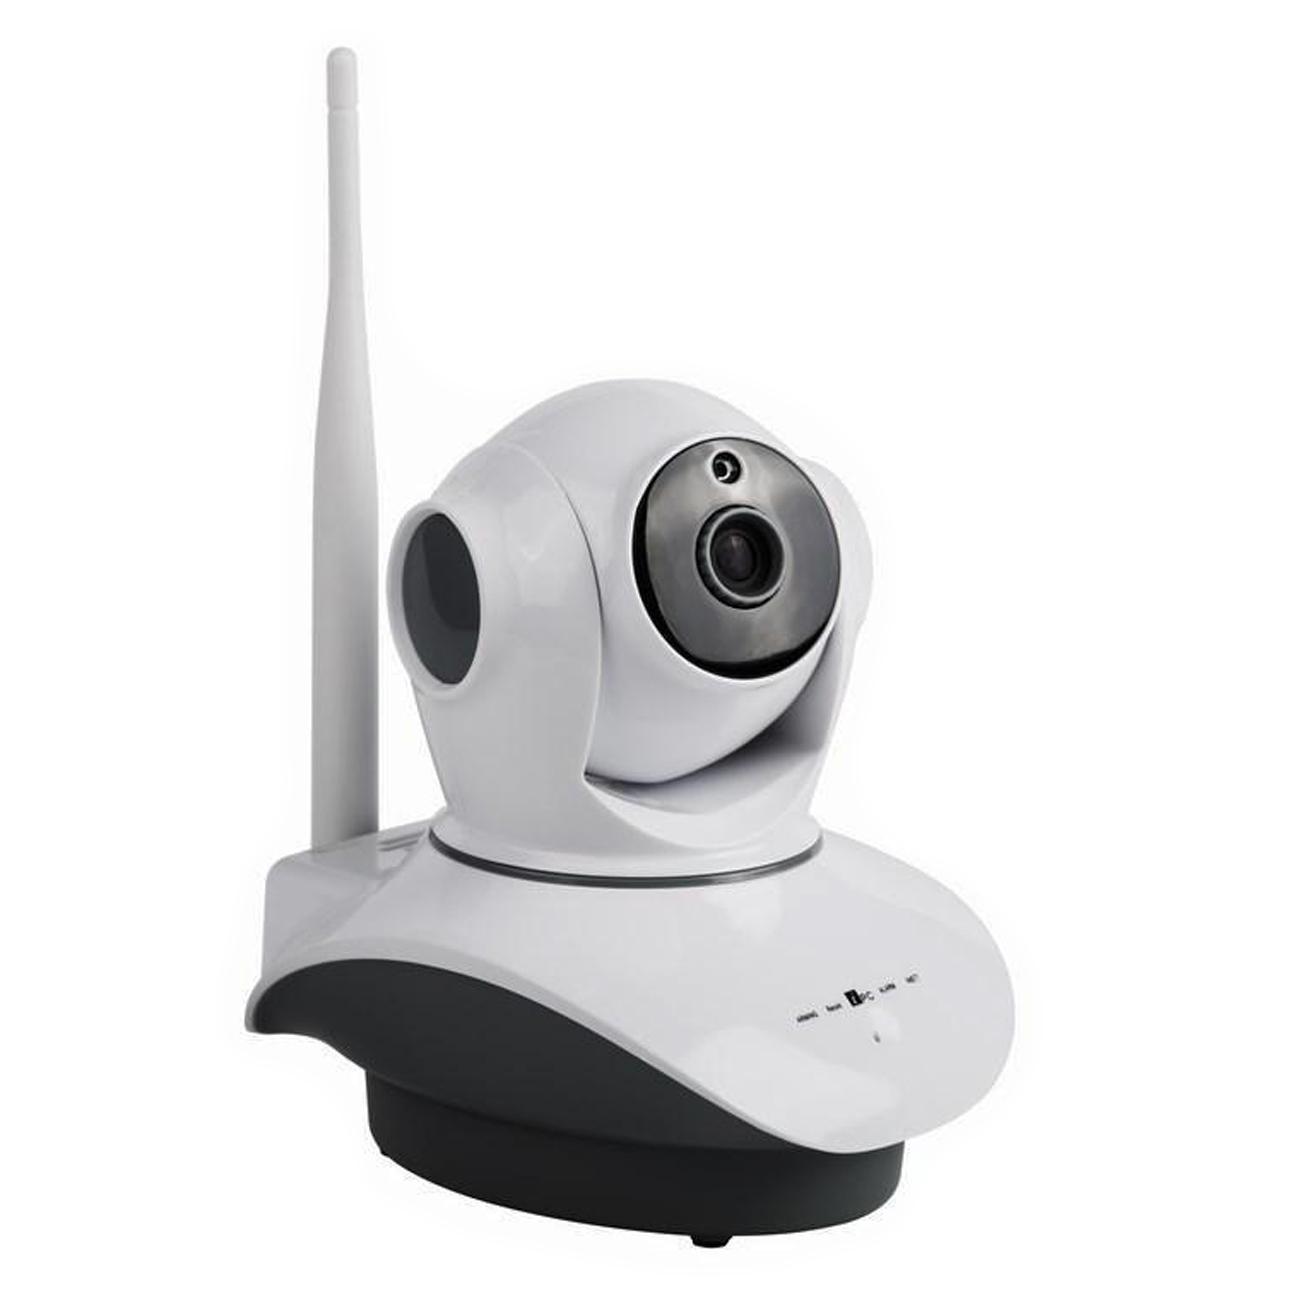 Фото Беспроводная поворотная 4G (LTE) Smart HD камера Rexant, ИК до 10 м {45-0269}